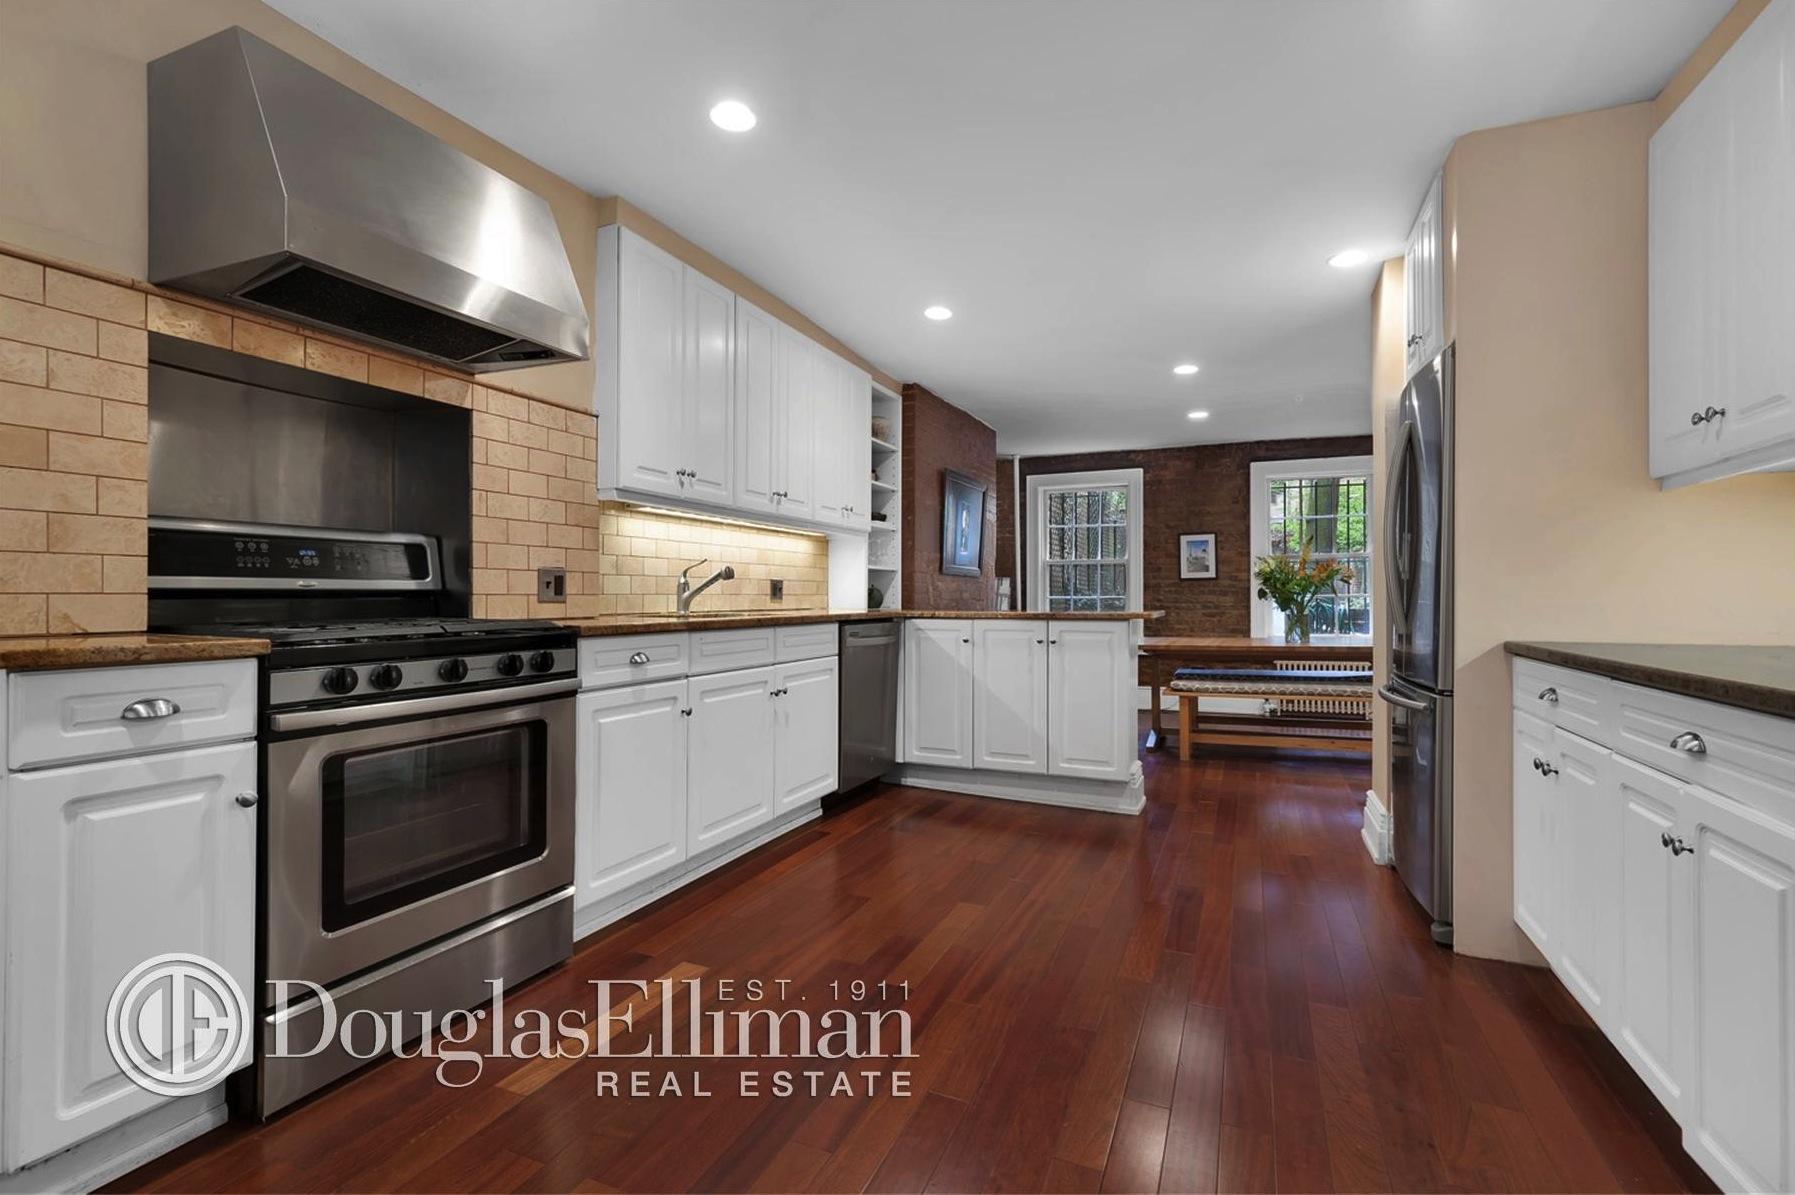 312 east 53rd street, kitchen, woodframe house,